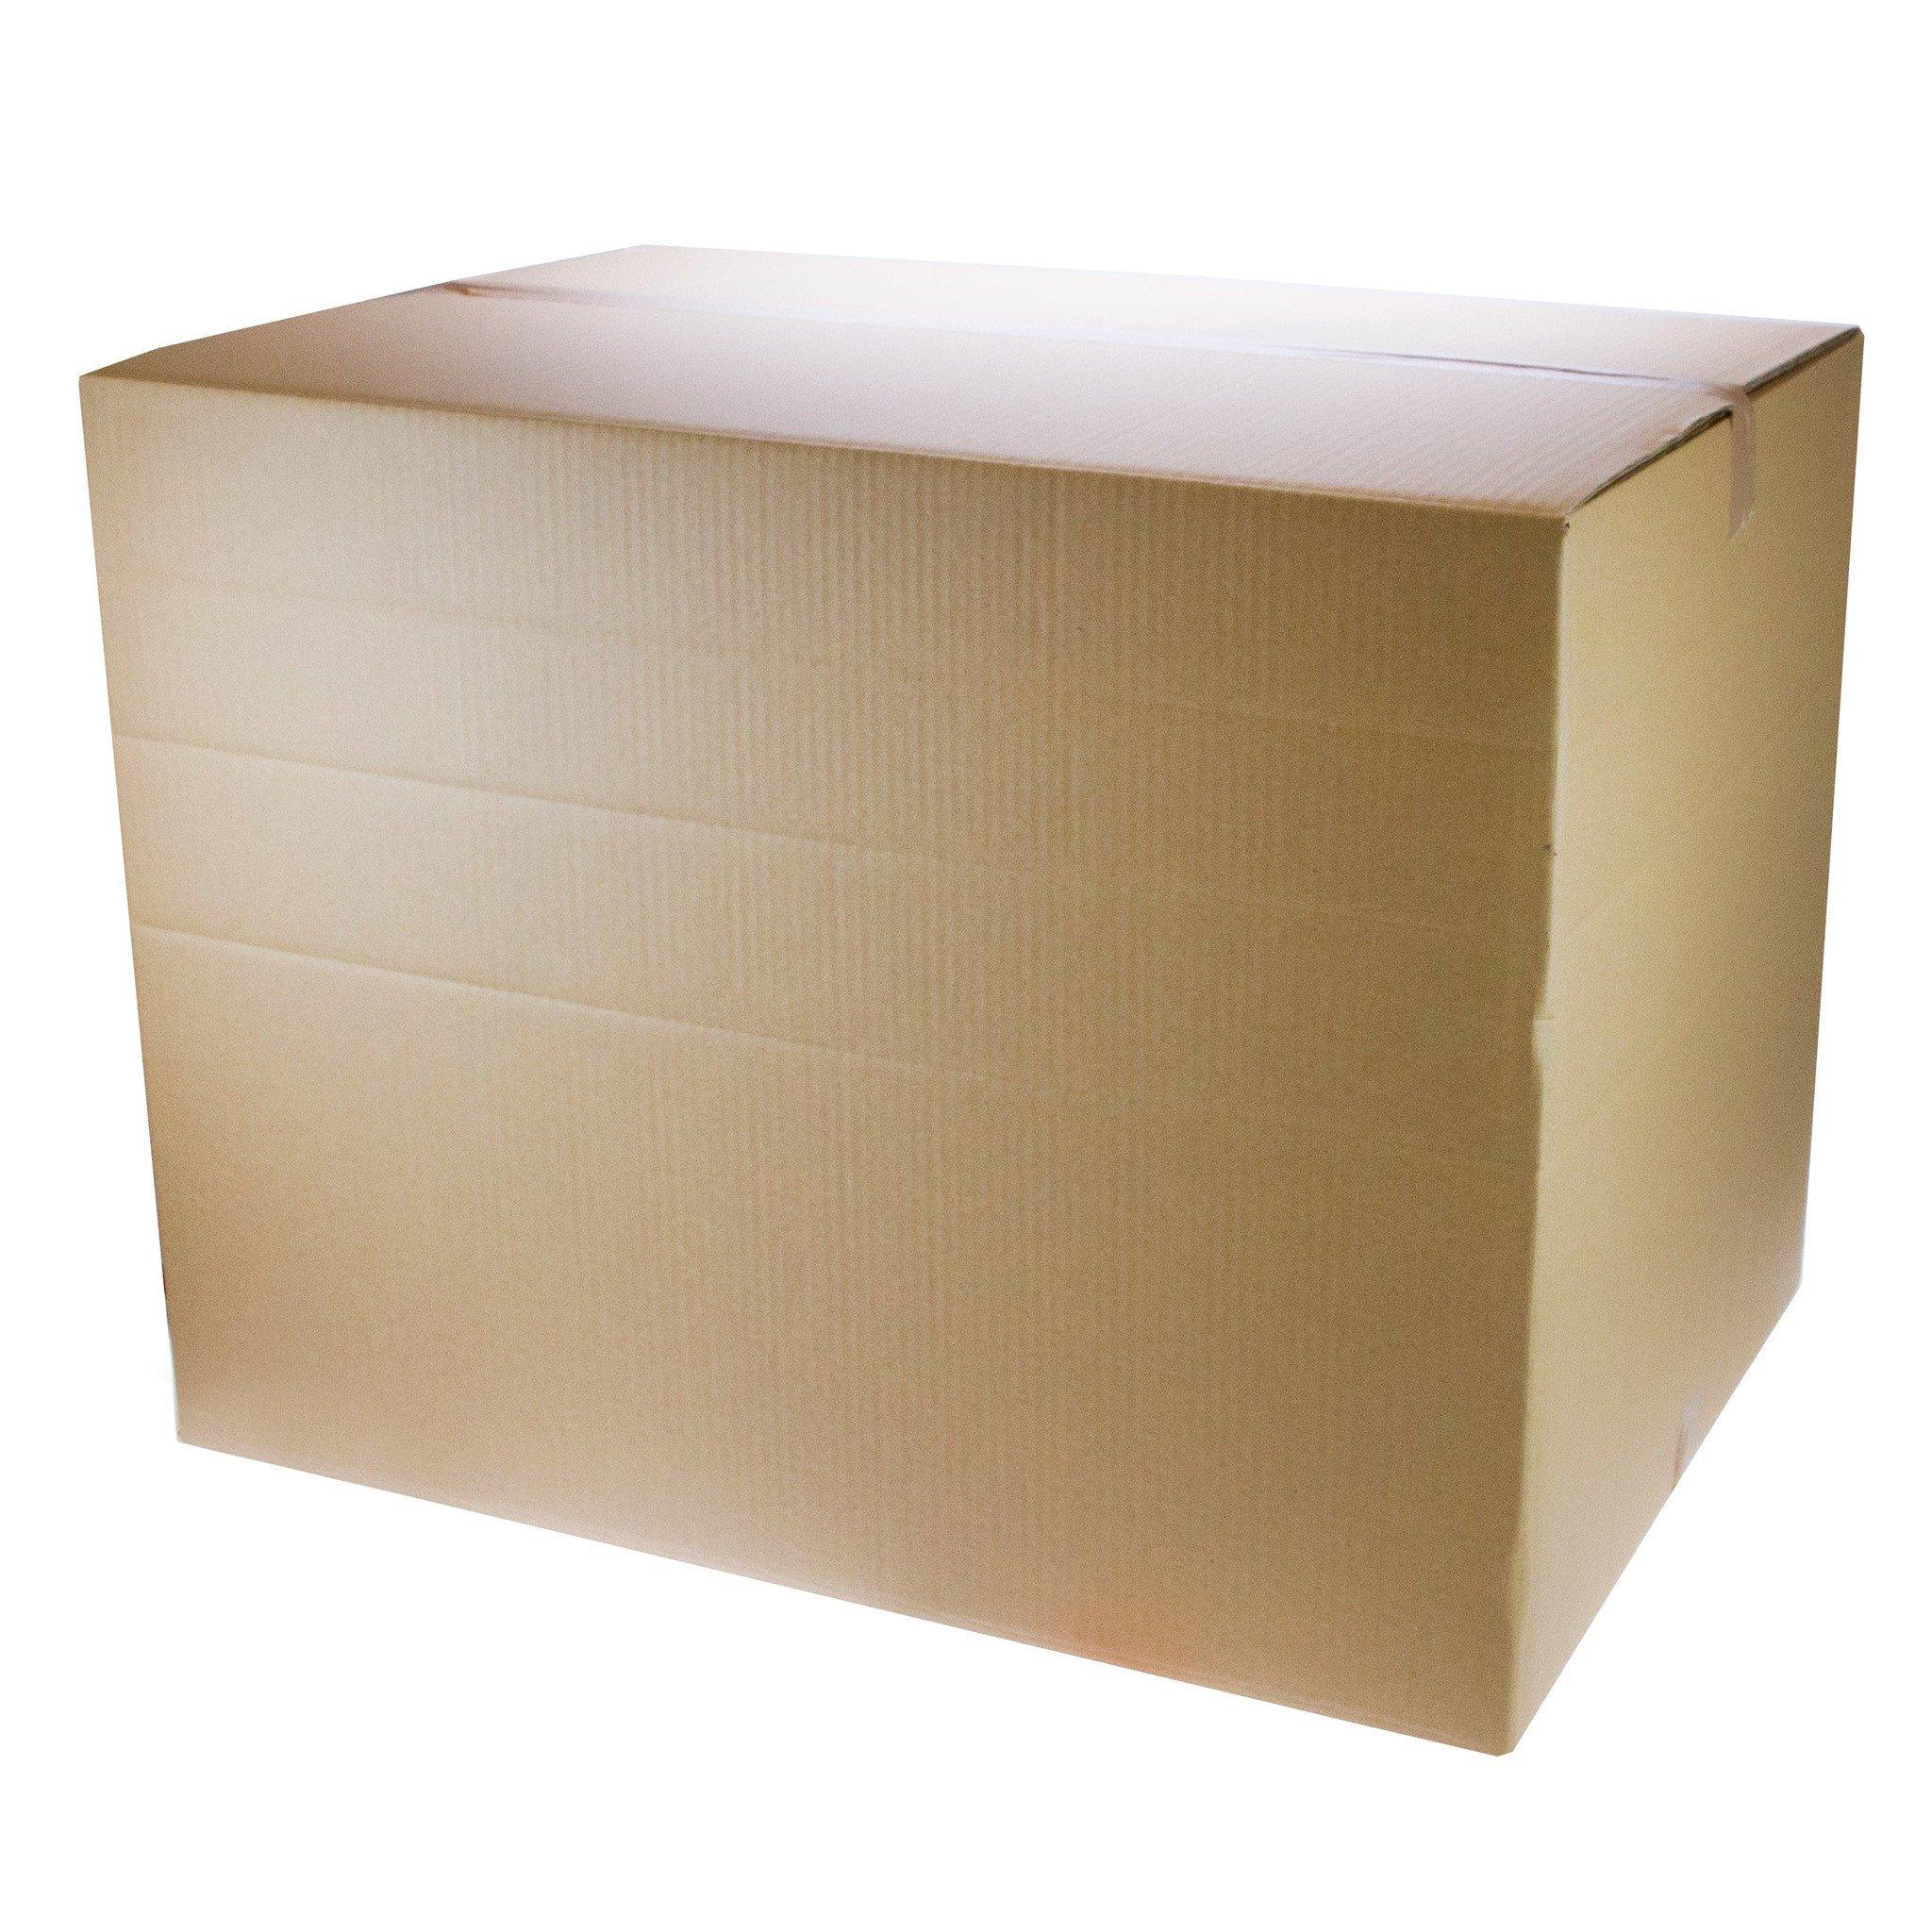 Cardboard Box 59193 – Fred Aldous